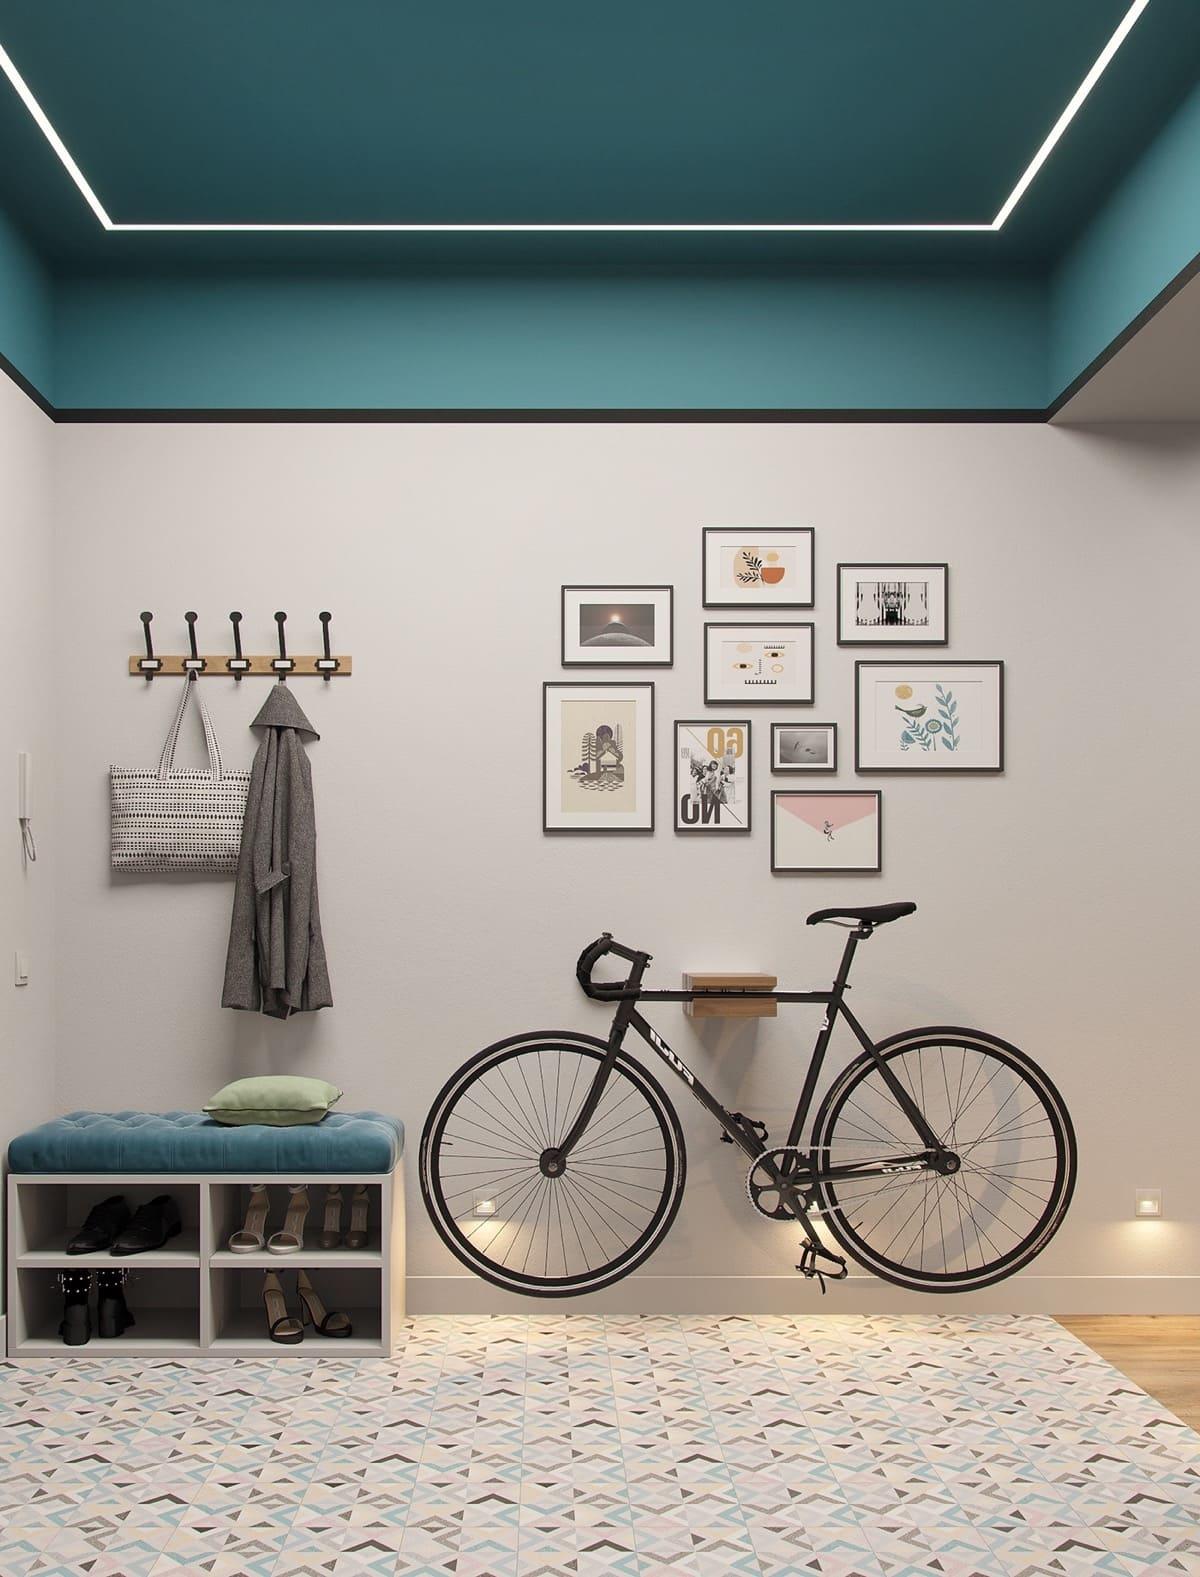 дизайн интерьера модной квартиры фото 57